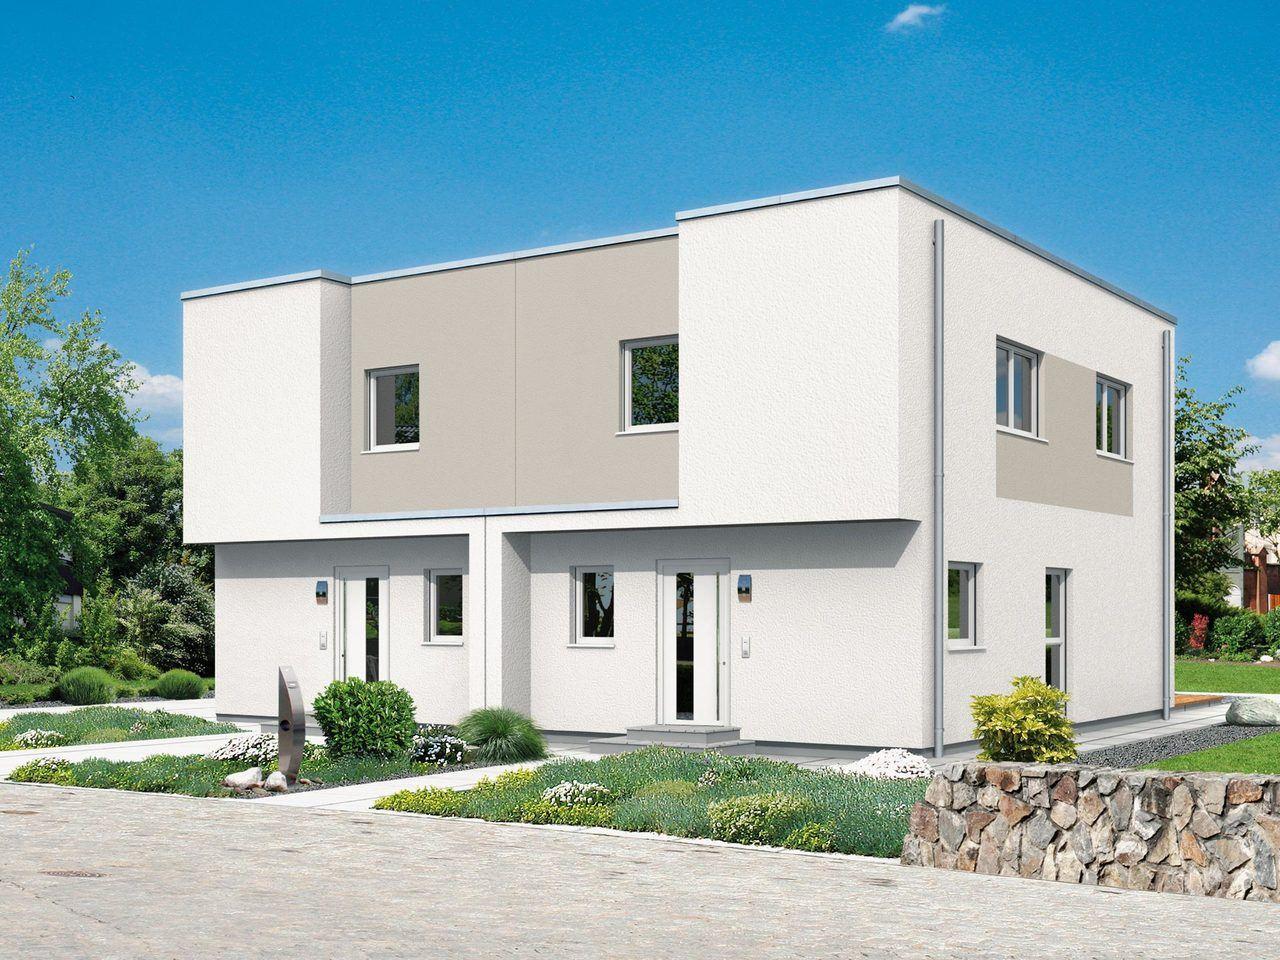 Schwabenhaus Bauhaus Avantgarde D Ansicht 2